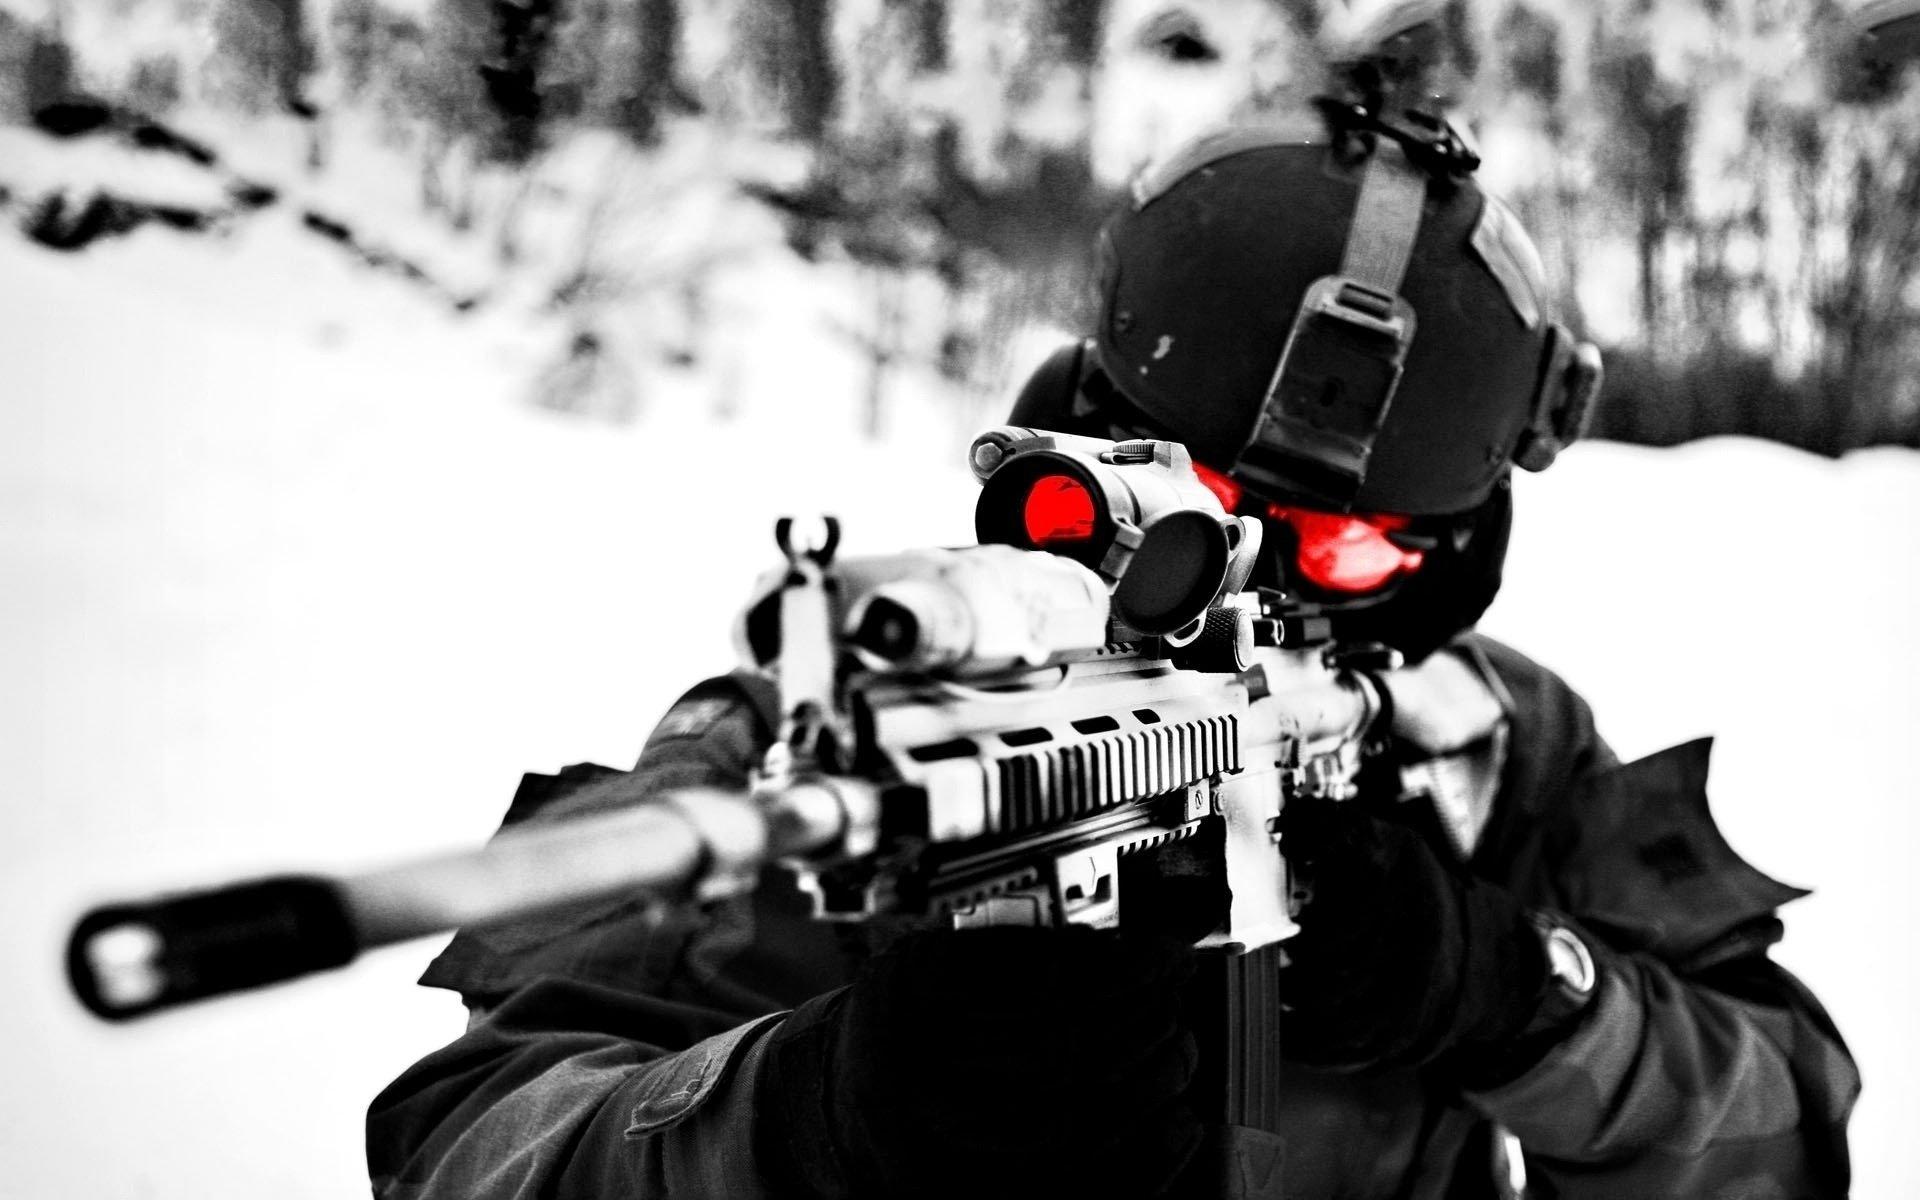 58 Call Of Duty Modern Warfare 2 HD Wallpapers